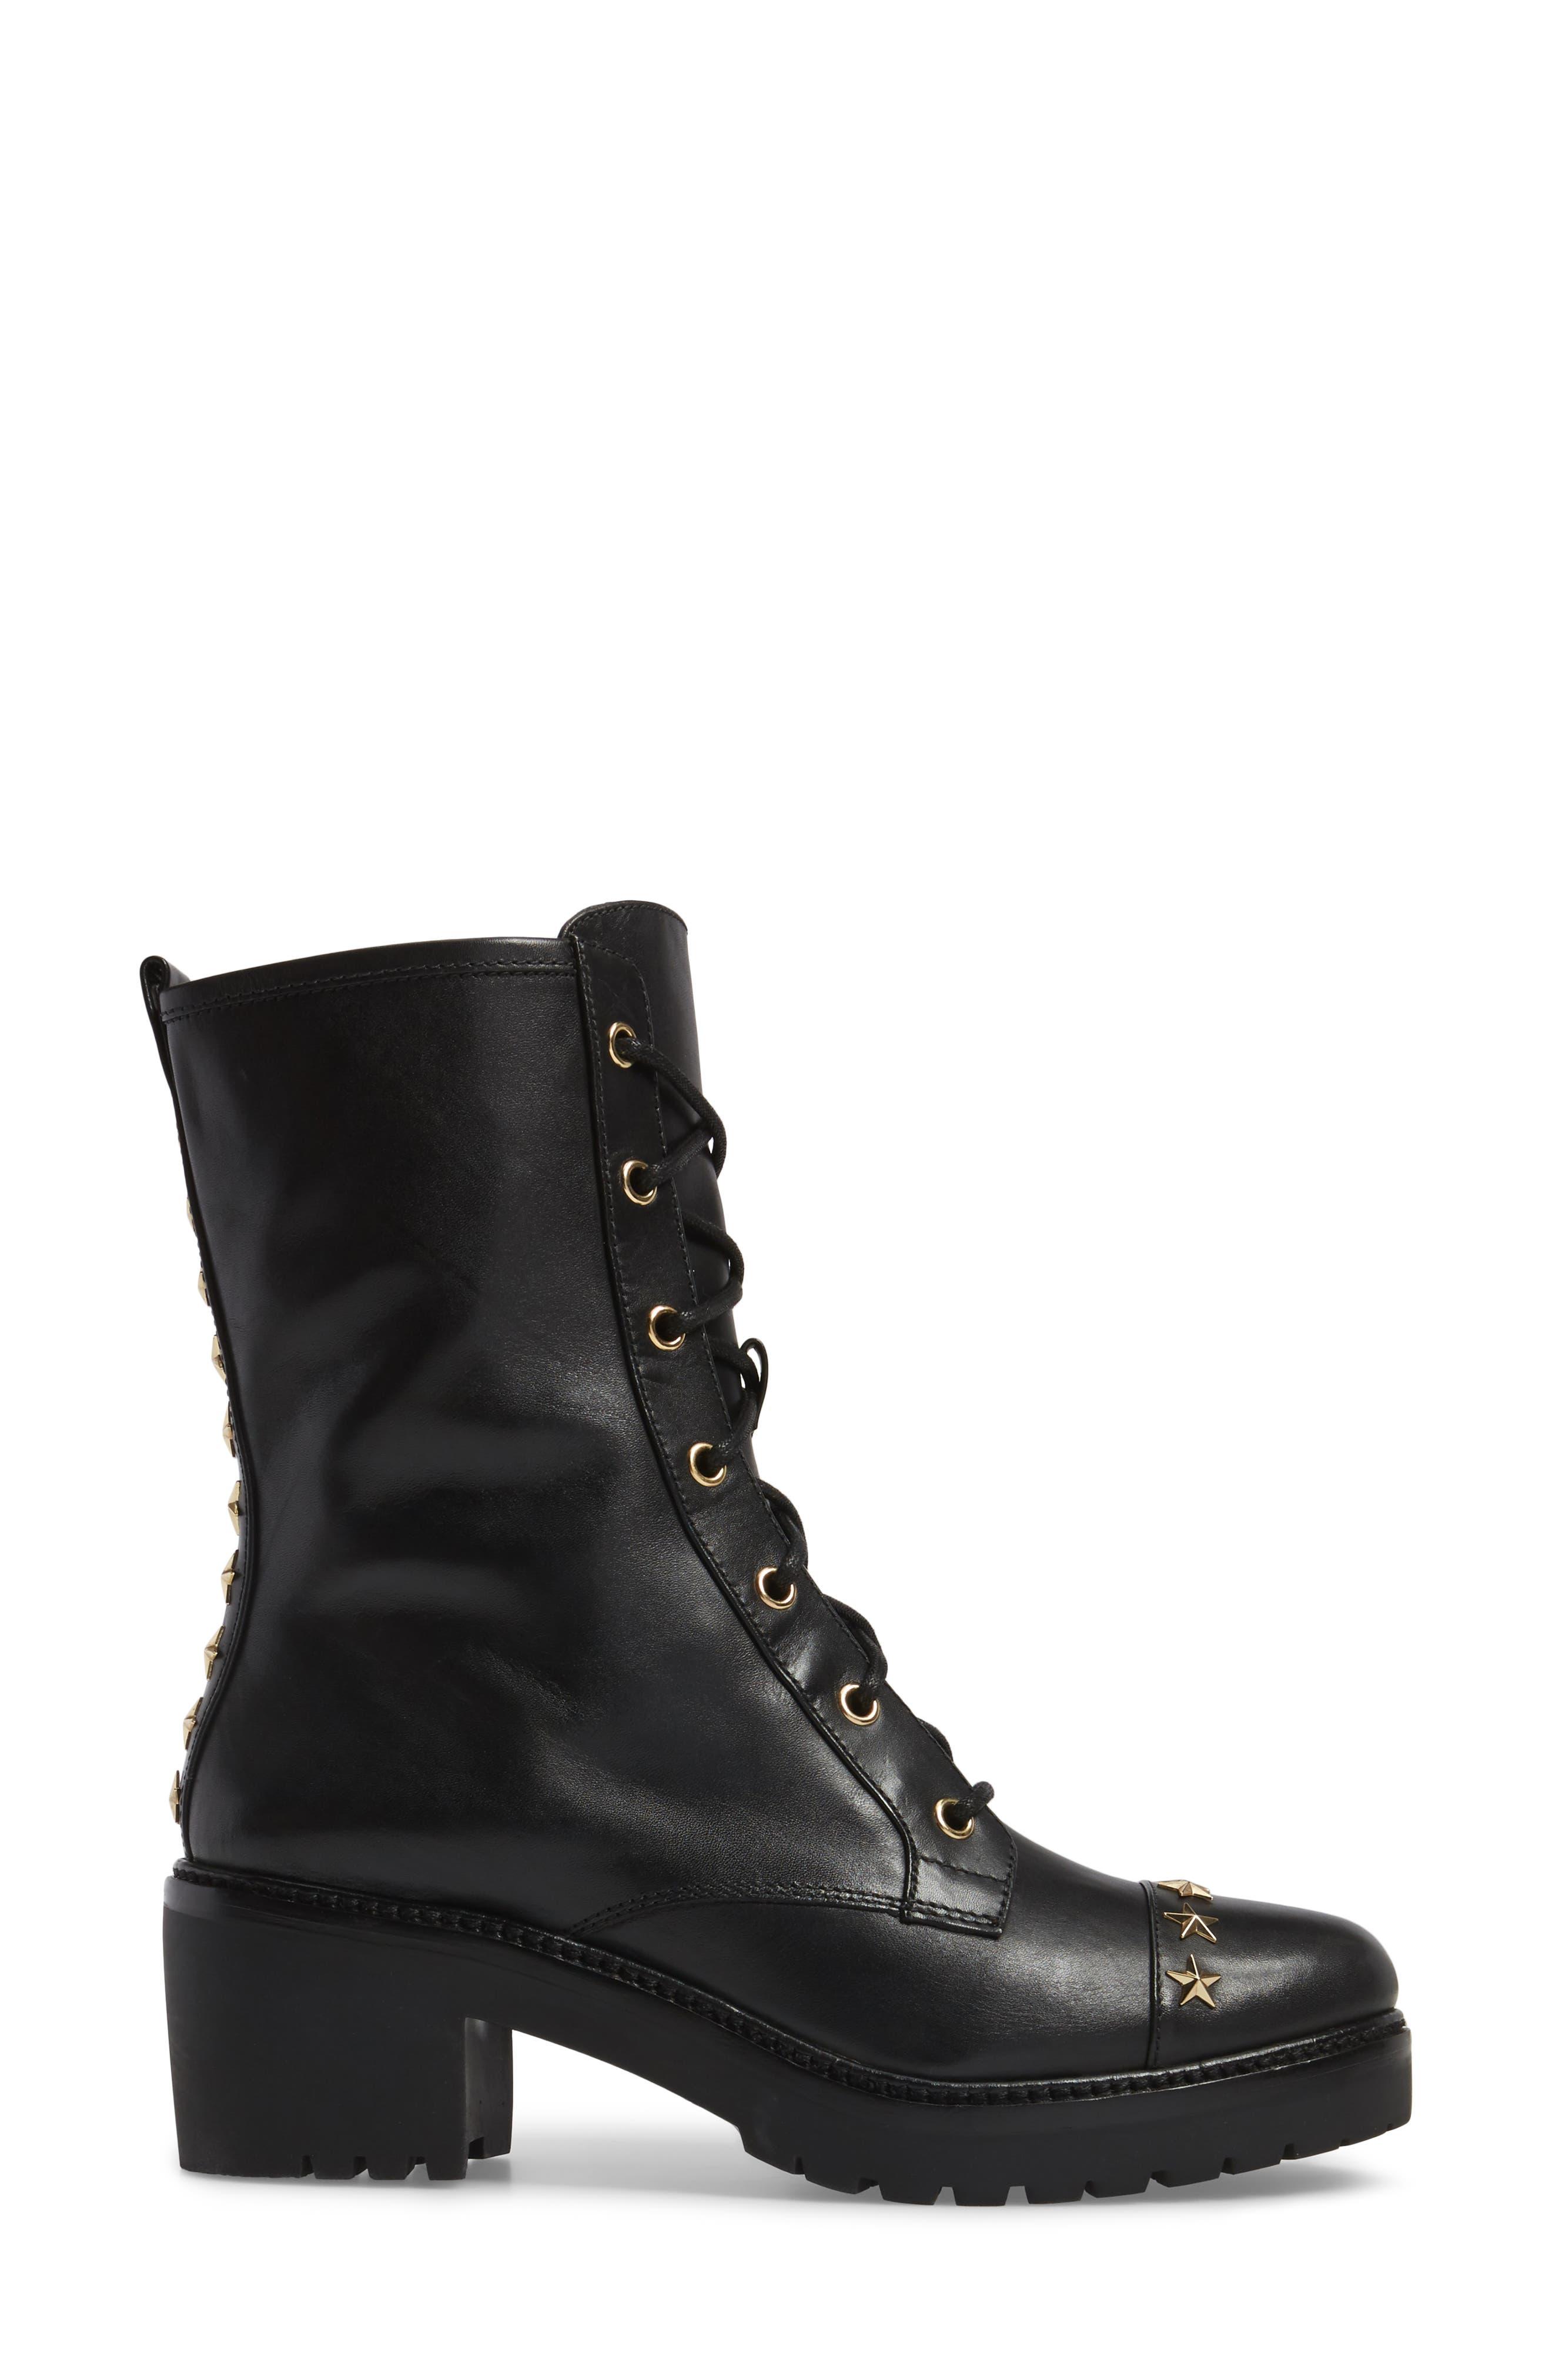 Cody Combat Boot,                             Alternate thumbnail 3, color,                             001